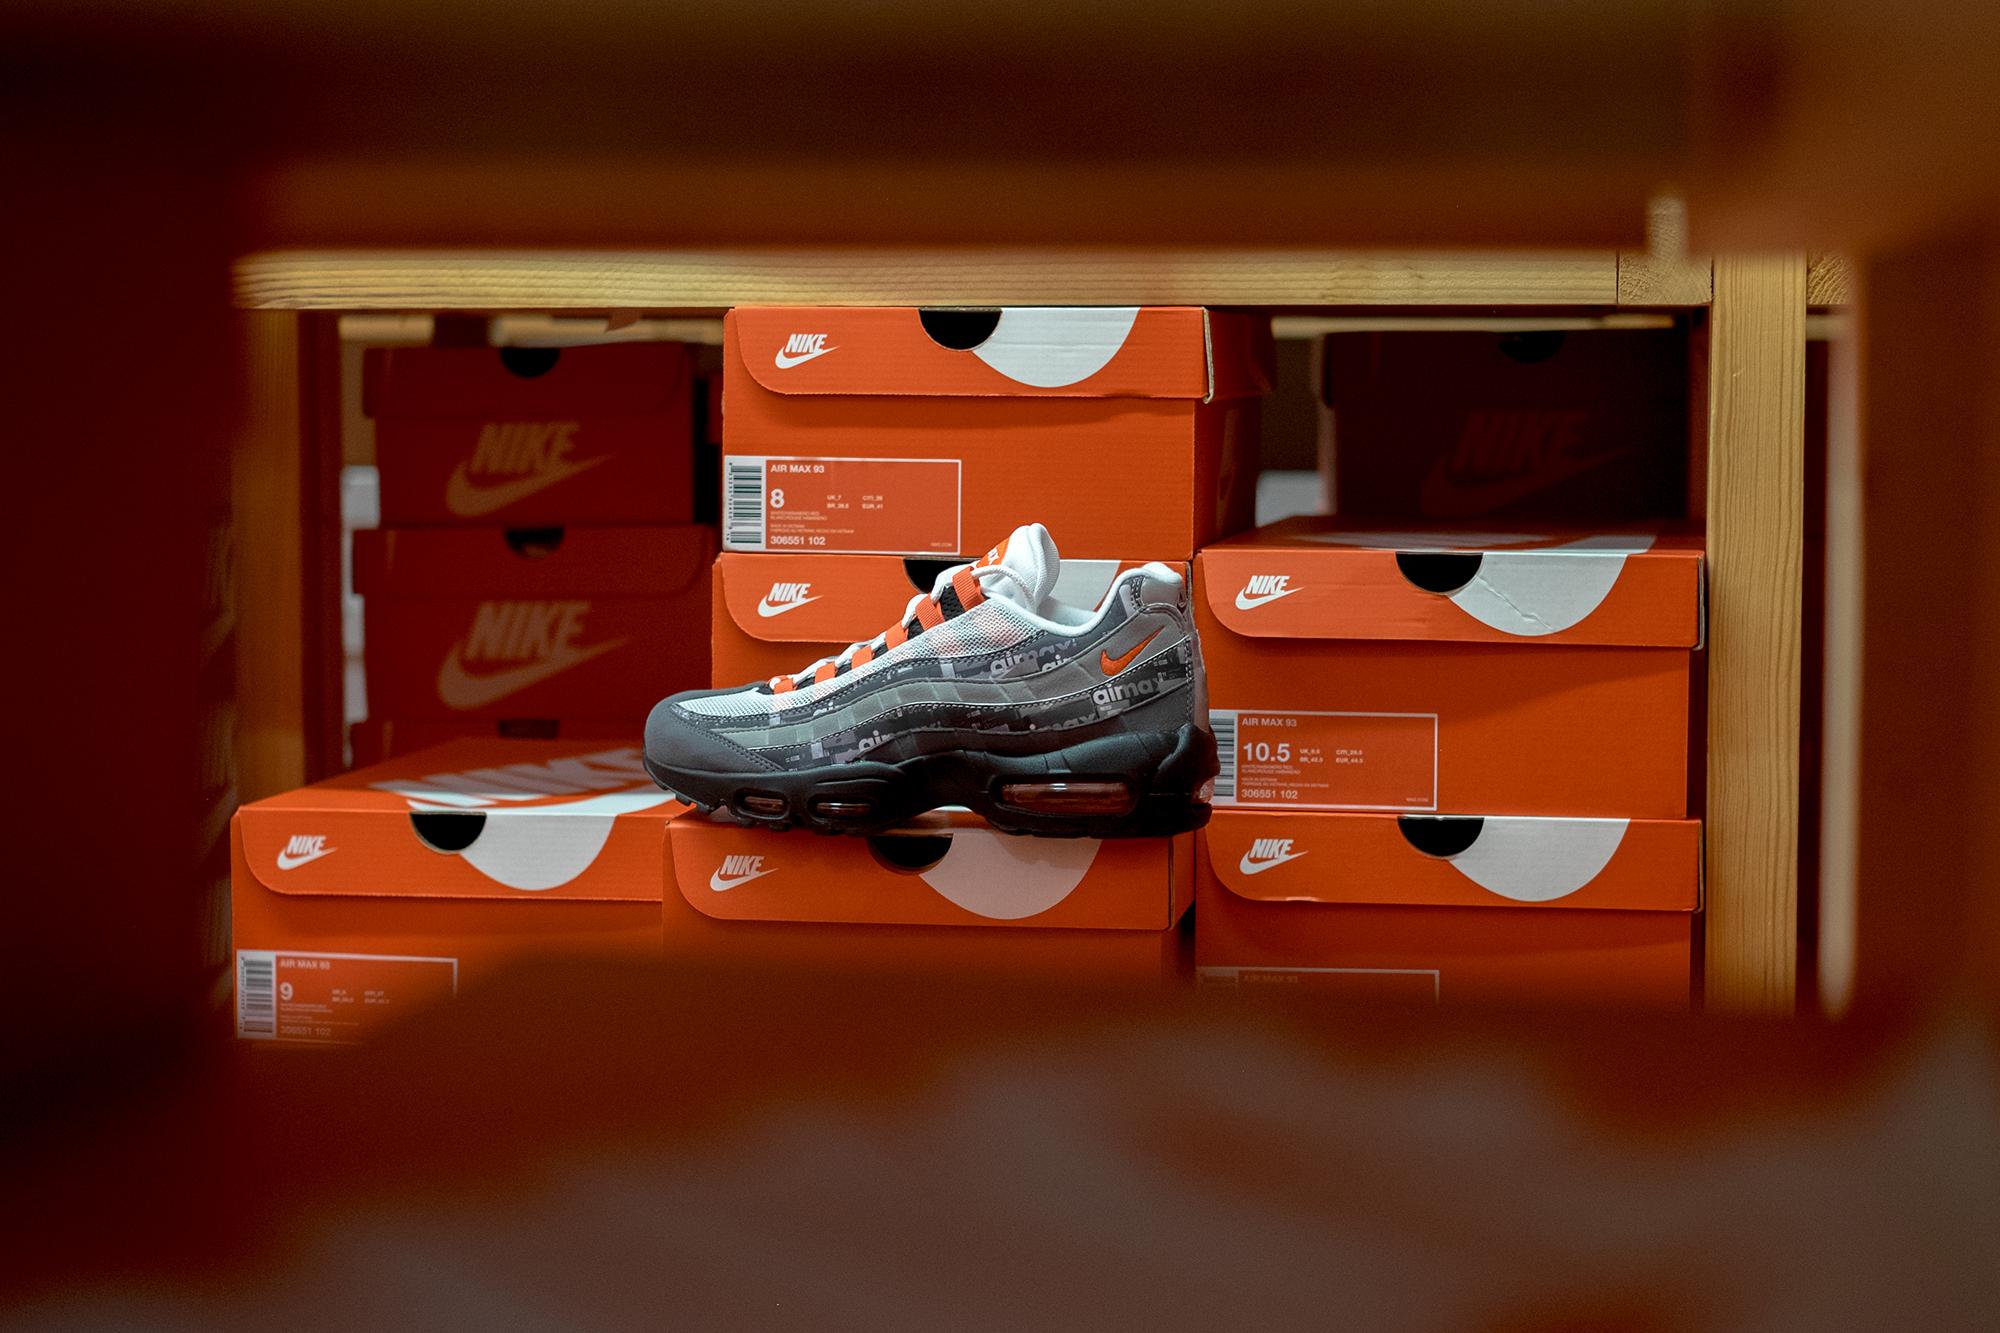 Nike x atmos 'Print' Pack